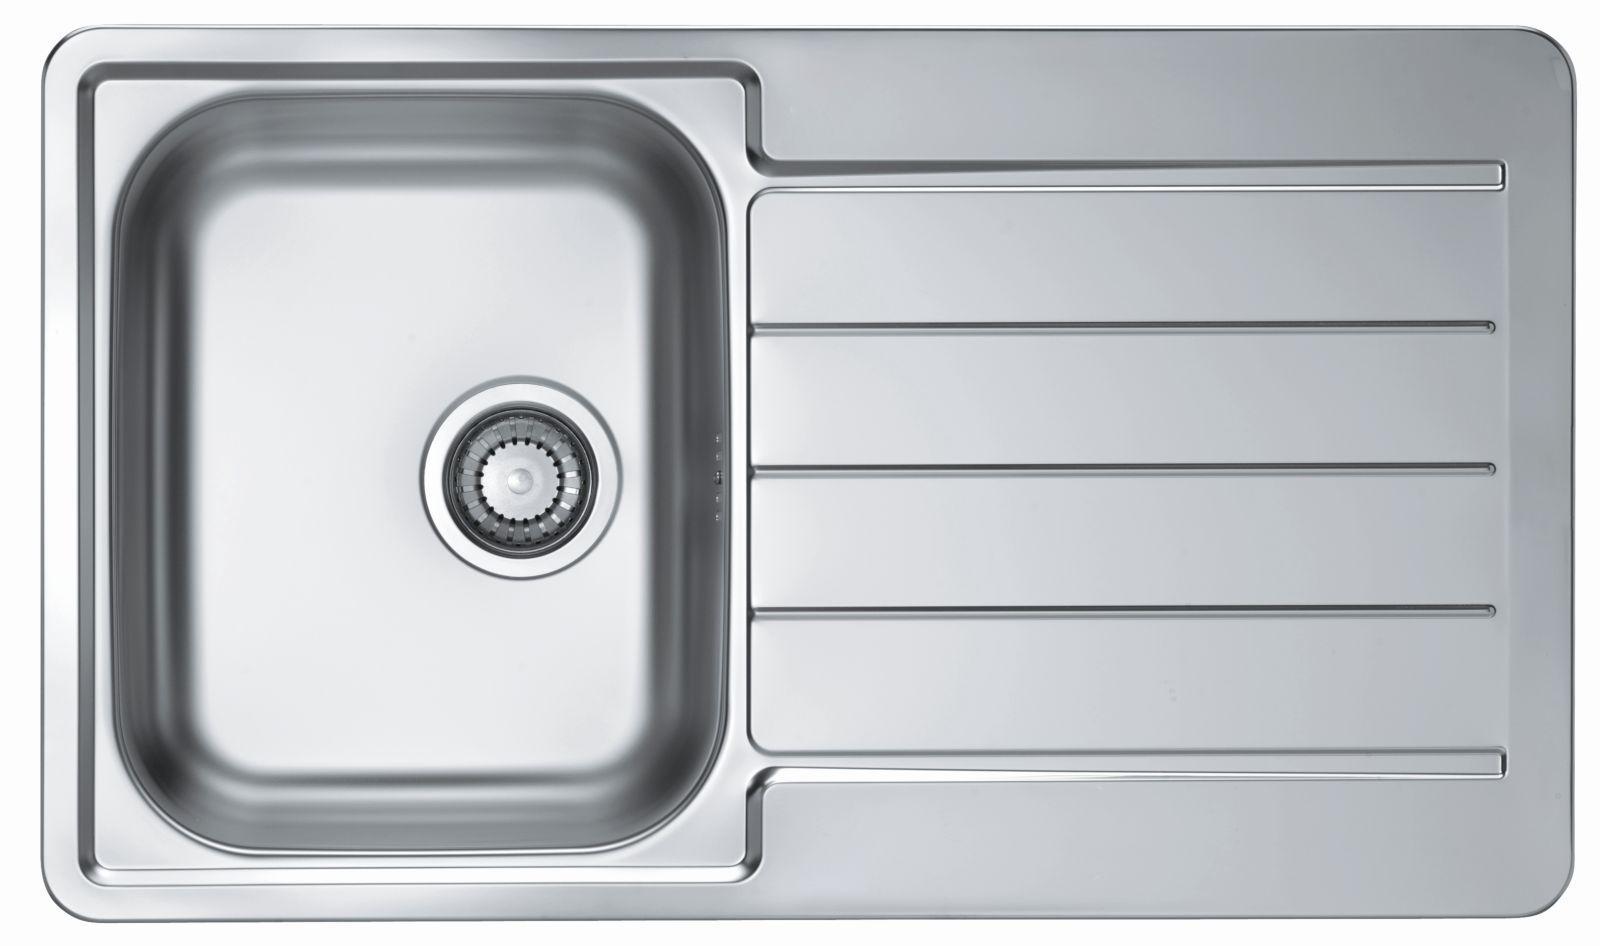 Alveus Spüle Küchenspüle 860x500 mm Einbauspüle Spülbecken Edelstahl ...